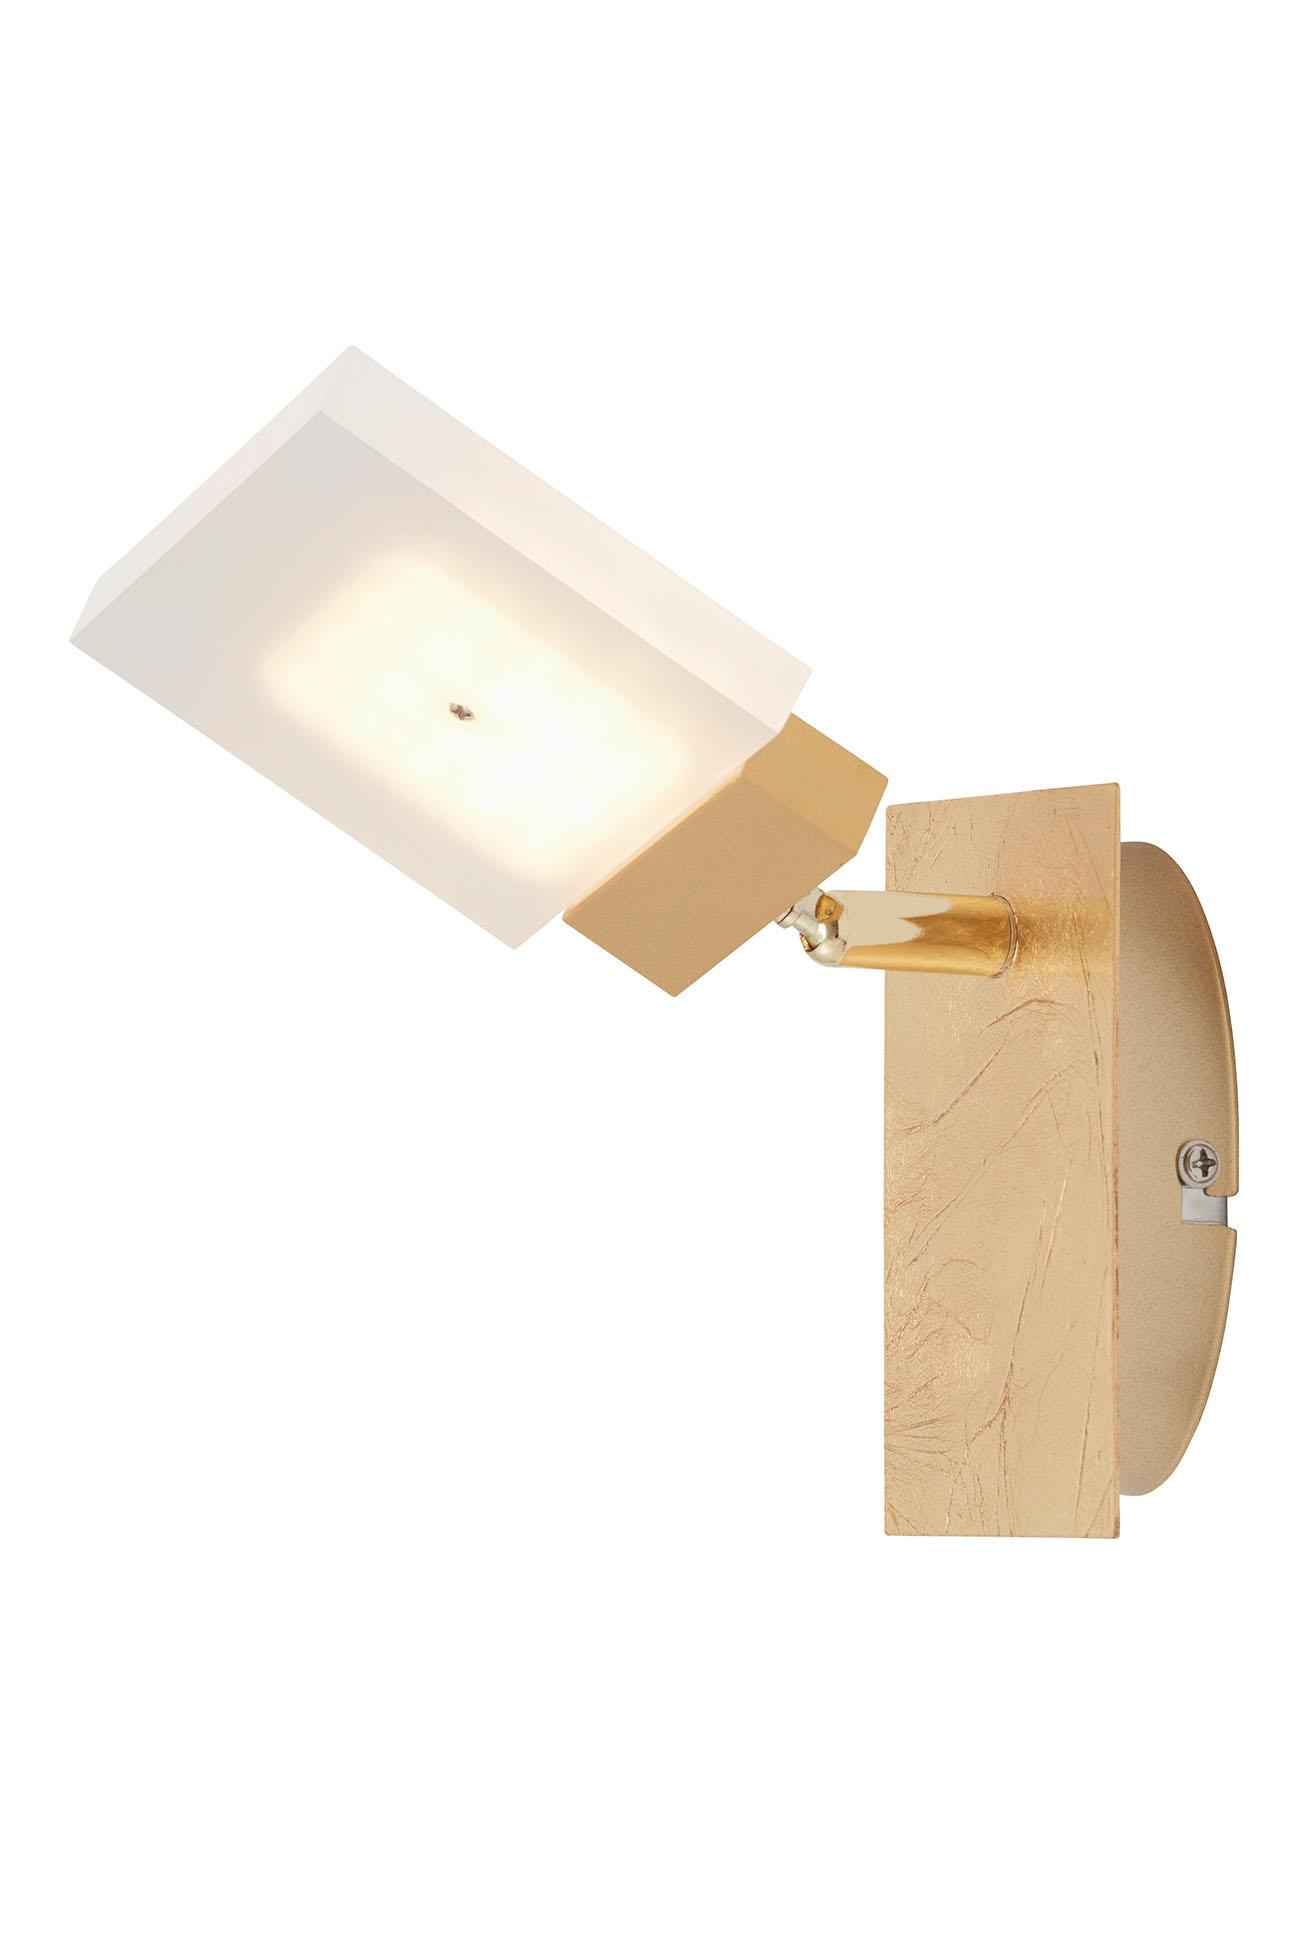 LED Spot Wandleuchte, 12 cm, 4,5 W, Gold